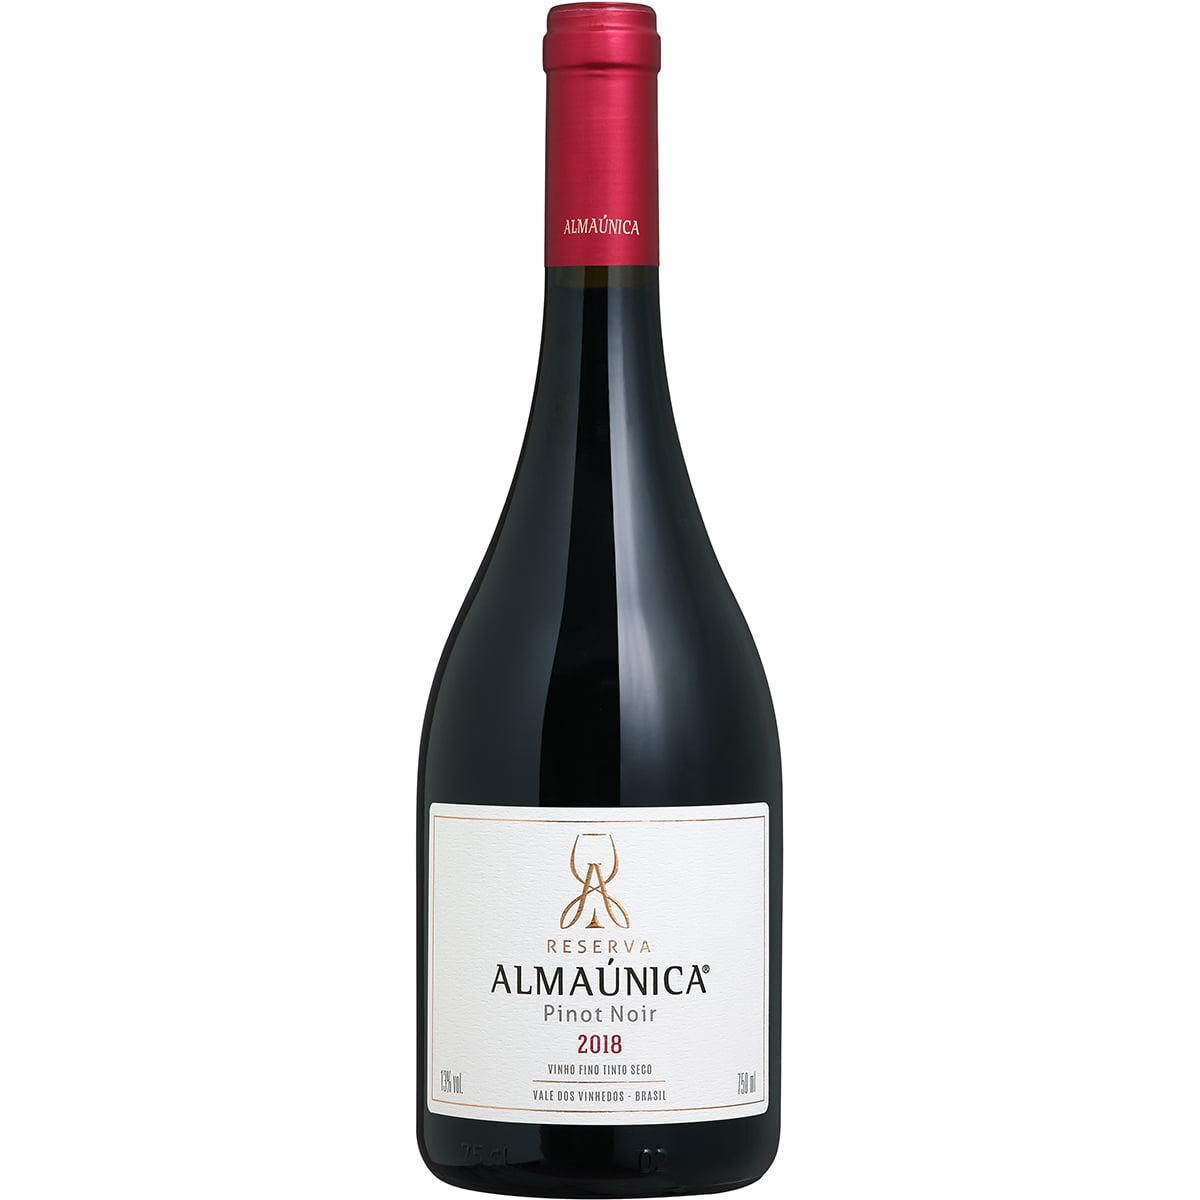 Vinho Almaúnica Reserva Pinot Noir Tinto 750ml